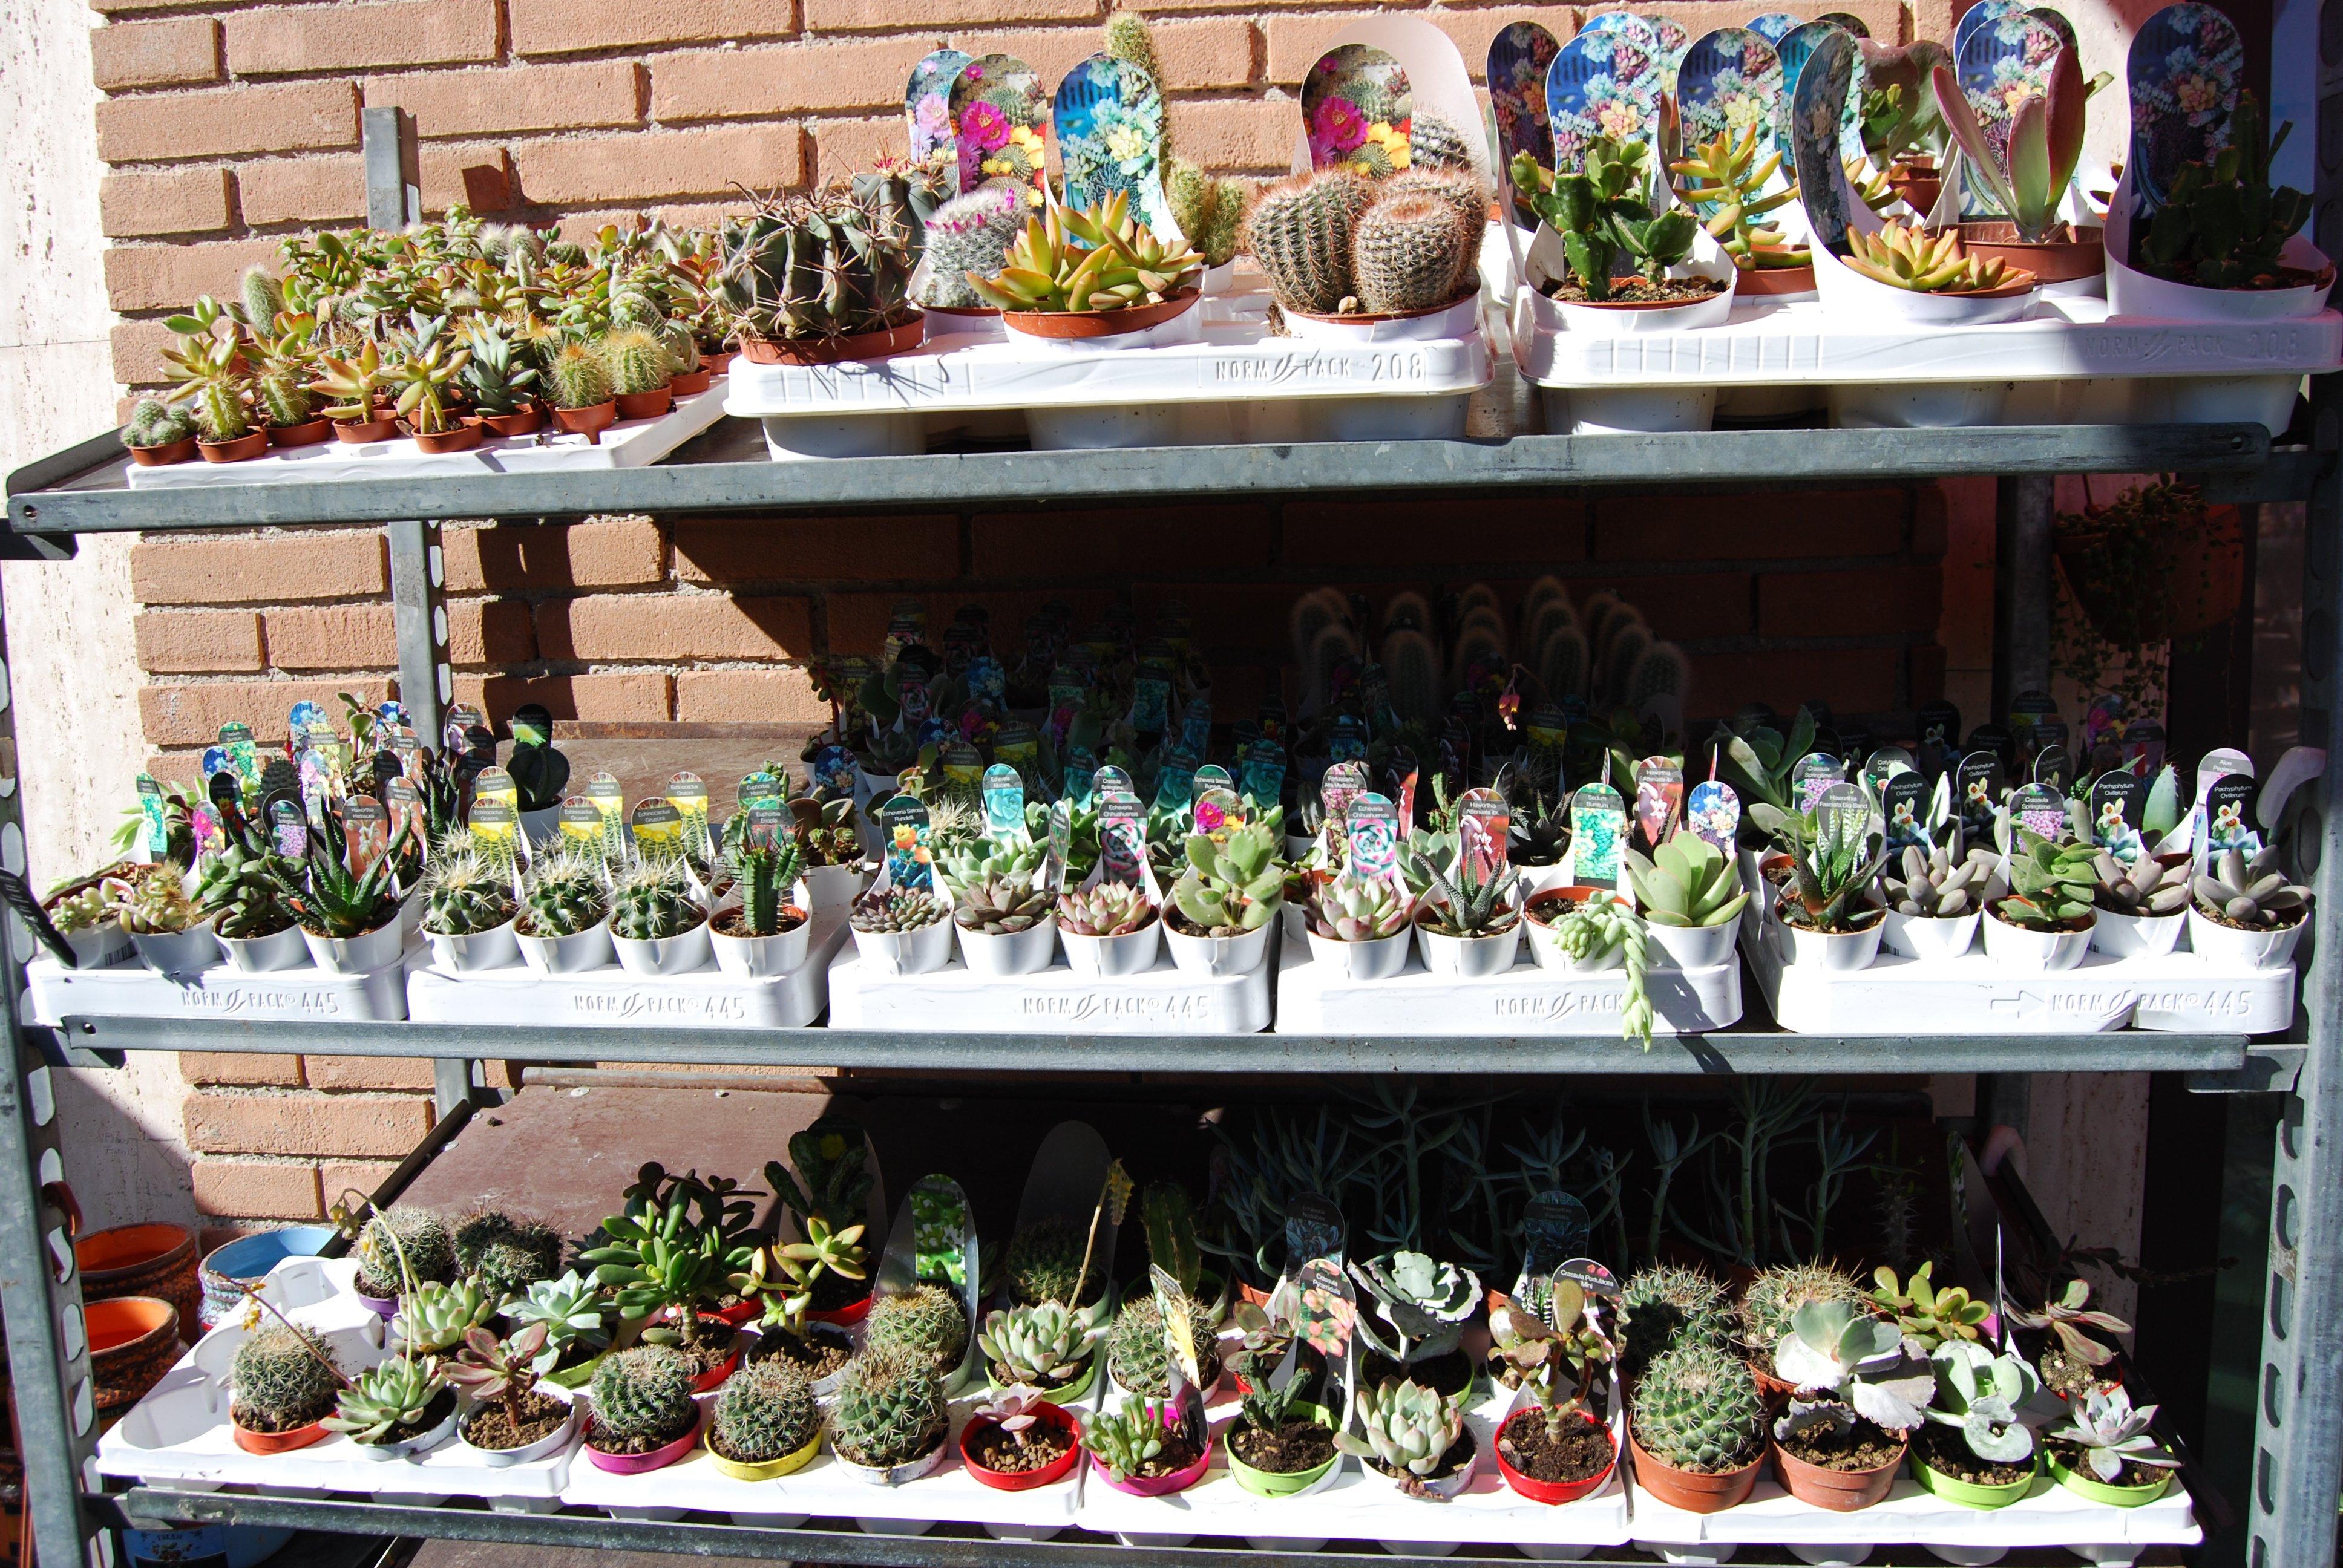 vasi di fiori in una fioriera